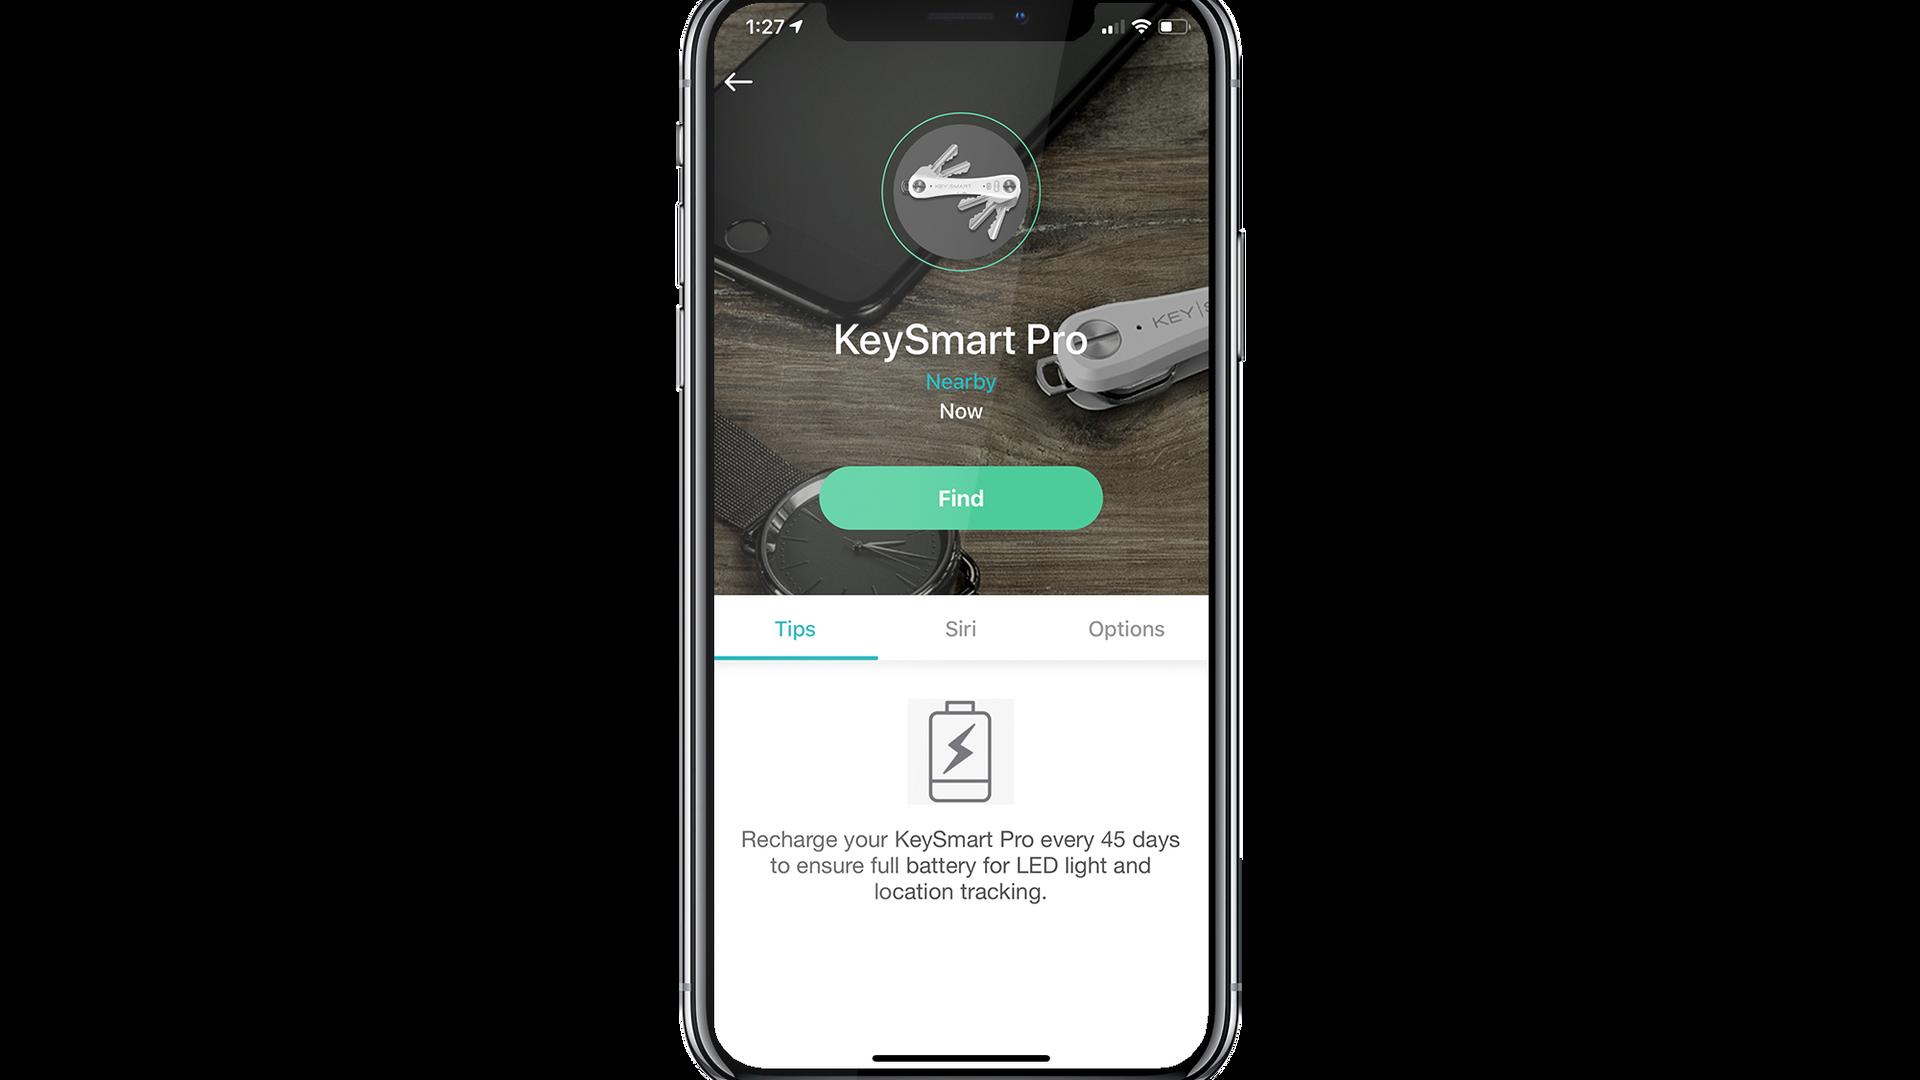 Find KeySmart